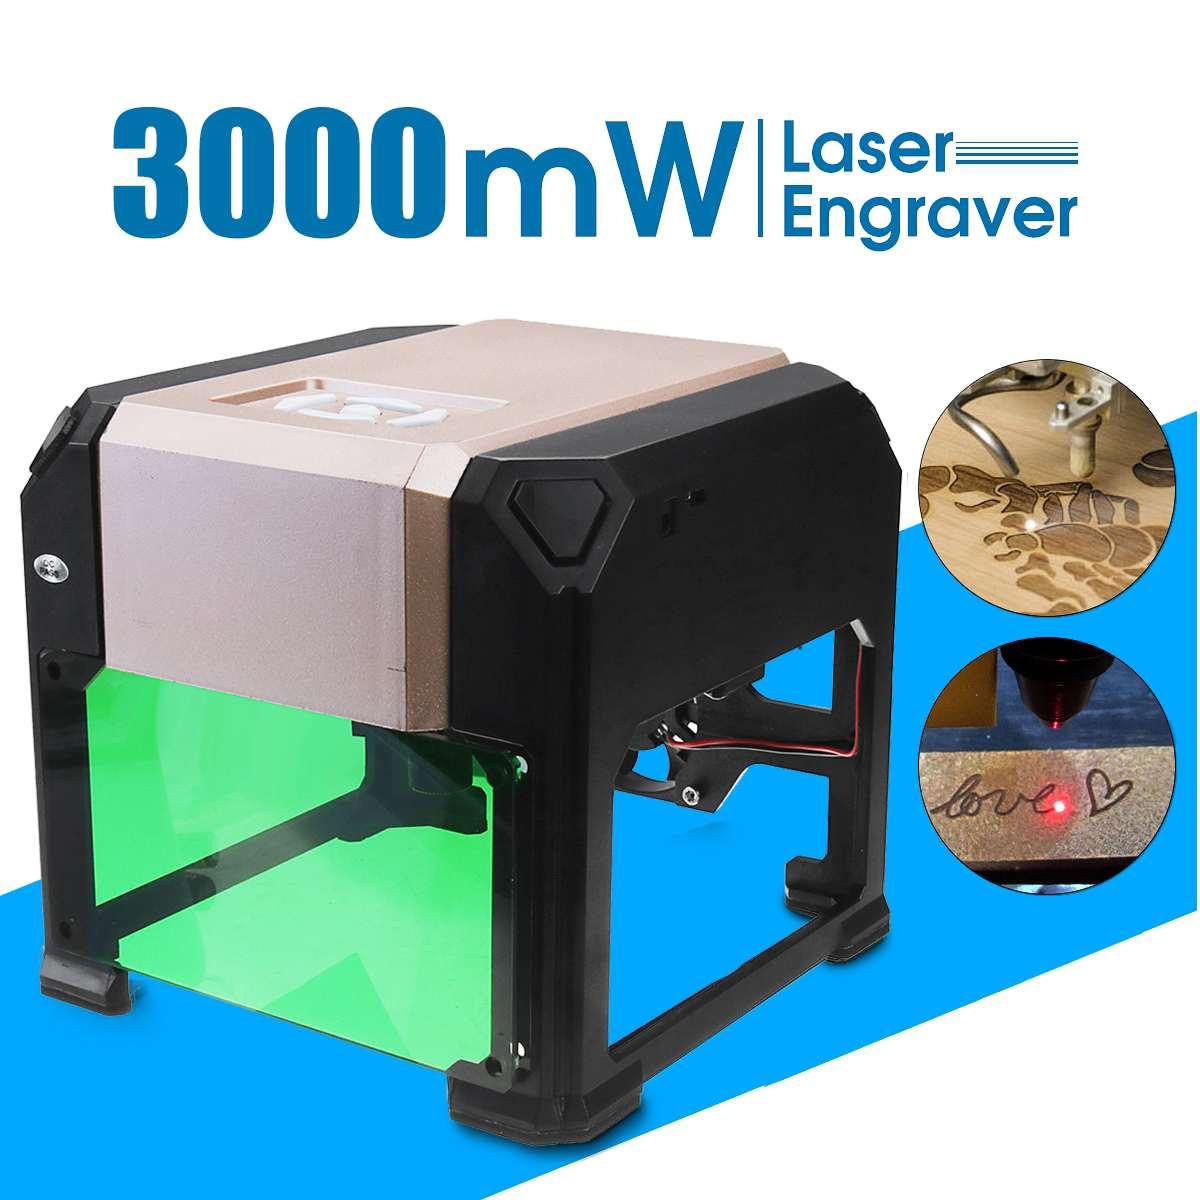 3000 mW CNC Laser Engraver DIY Logo Mark Printer Laser Engraving Carving Machine for Home Use Handicraft Wood Tools